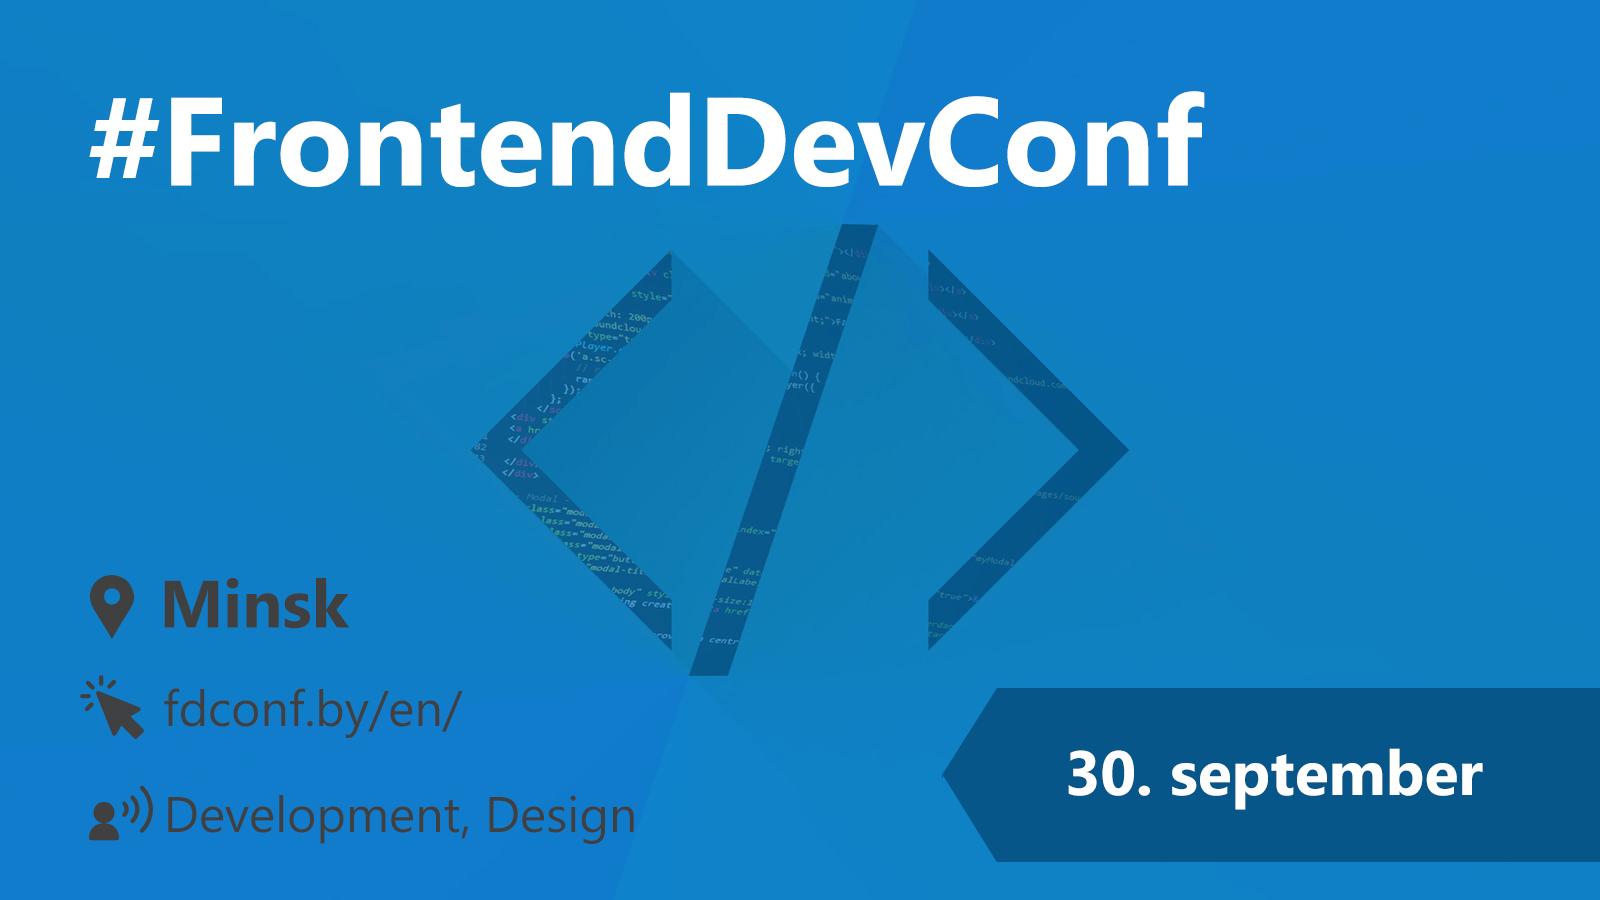 #FrontendDevConf 30.9